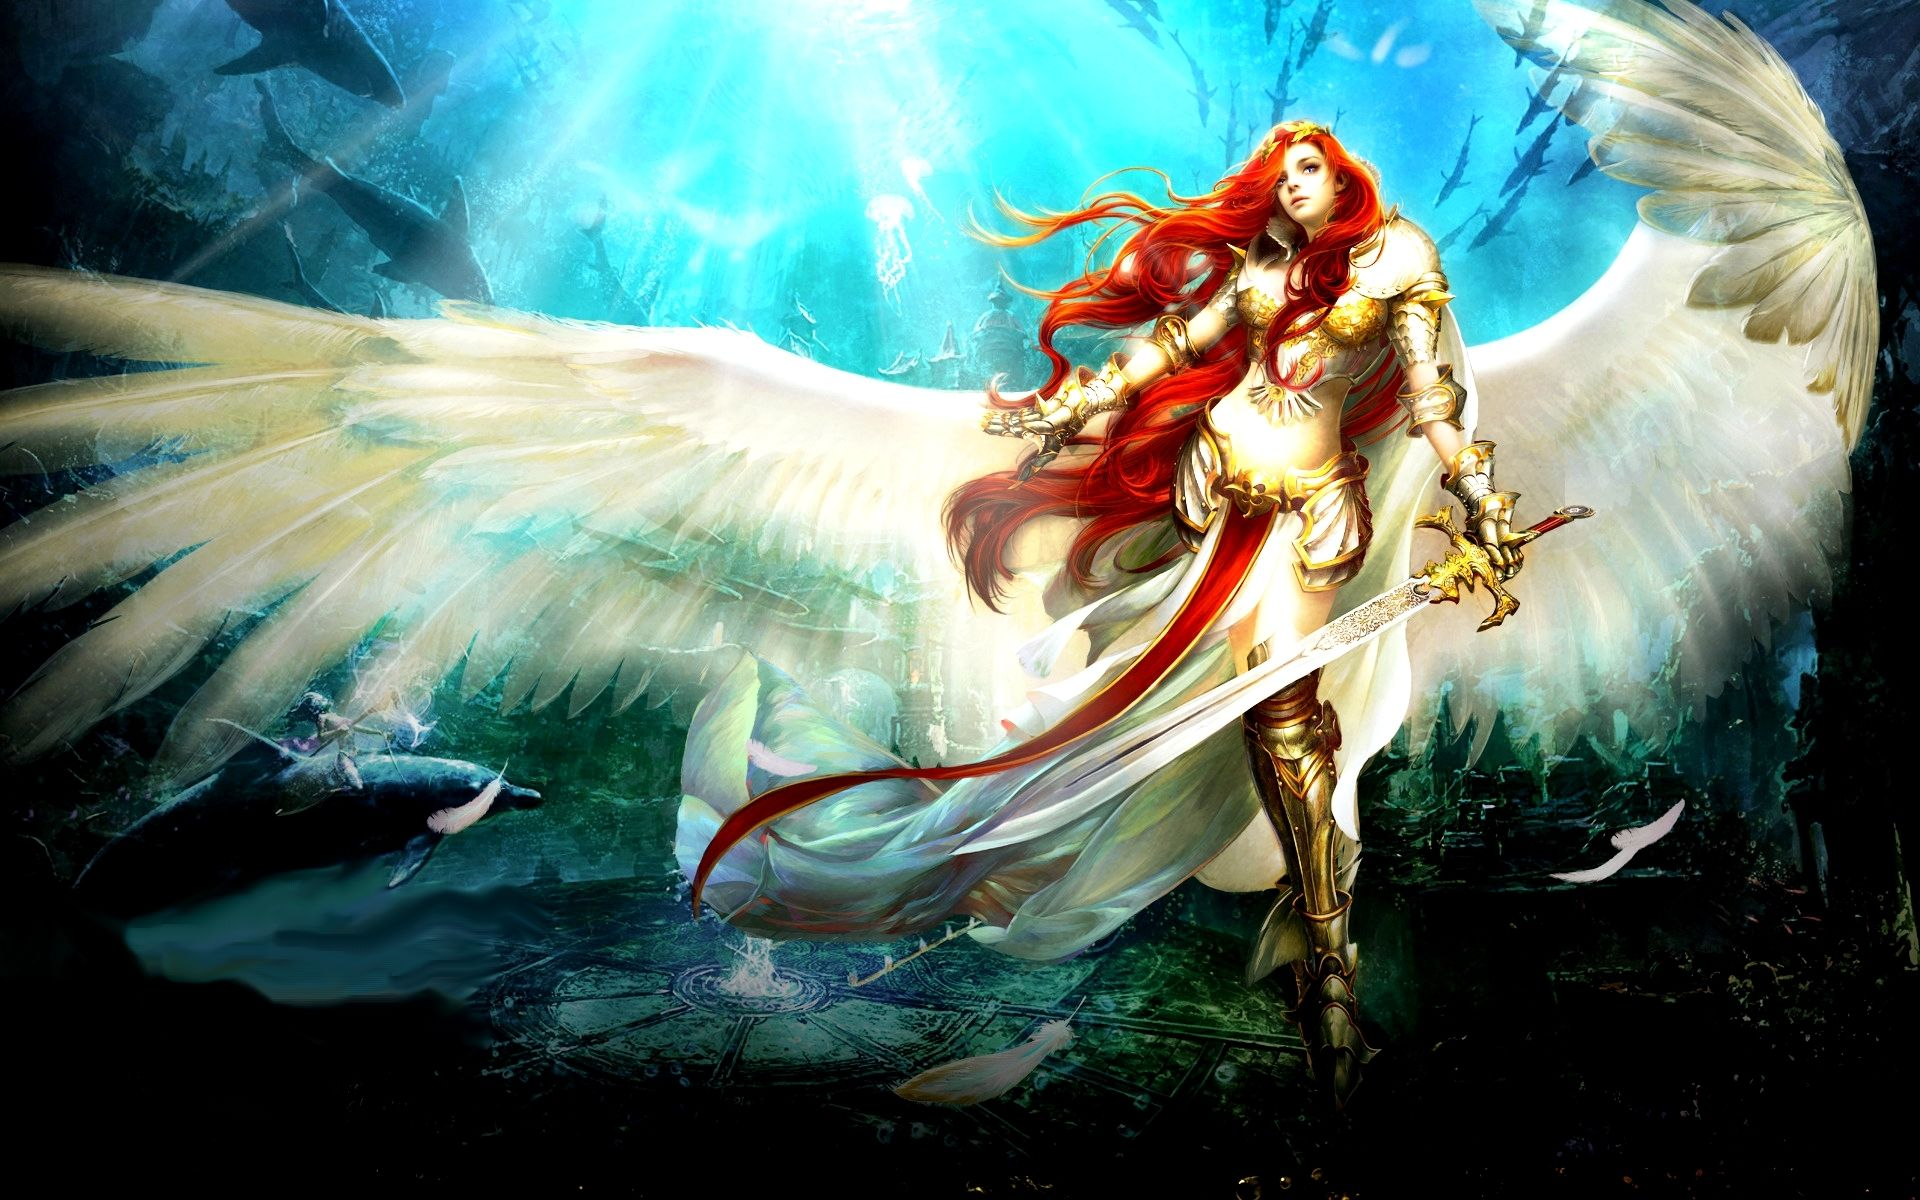 Fantasy Angel Warrior Fantasy Woman Girl Red Hair Wings Sword Armor Wallpaper Angel Warrior Fantasy Art Warrior Warriors Wallpaper